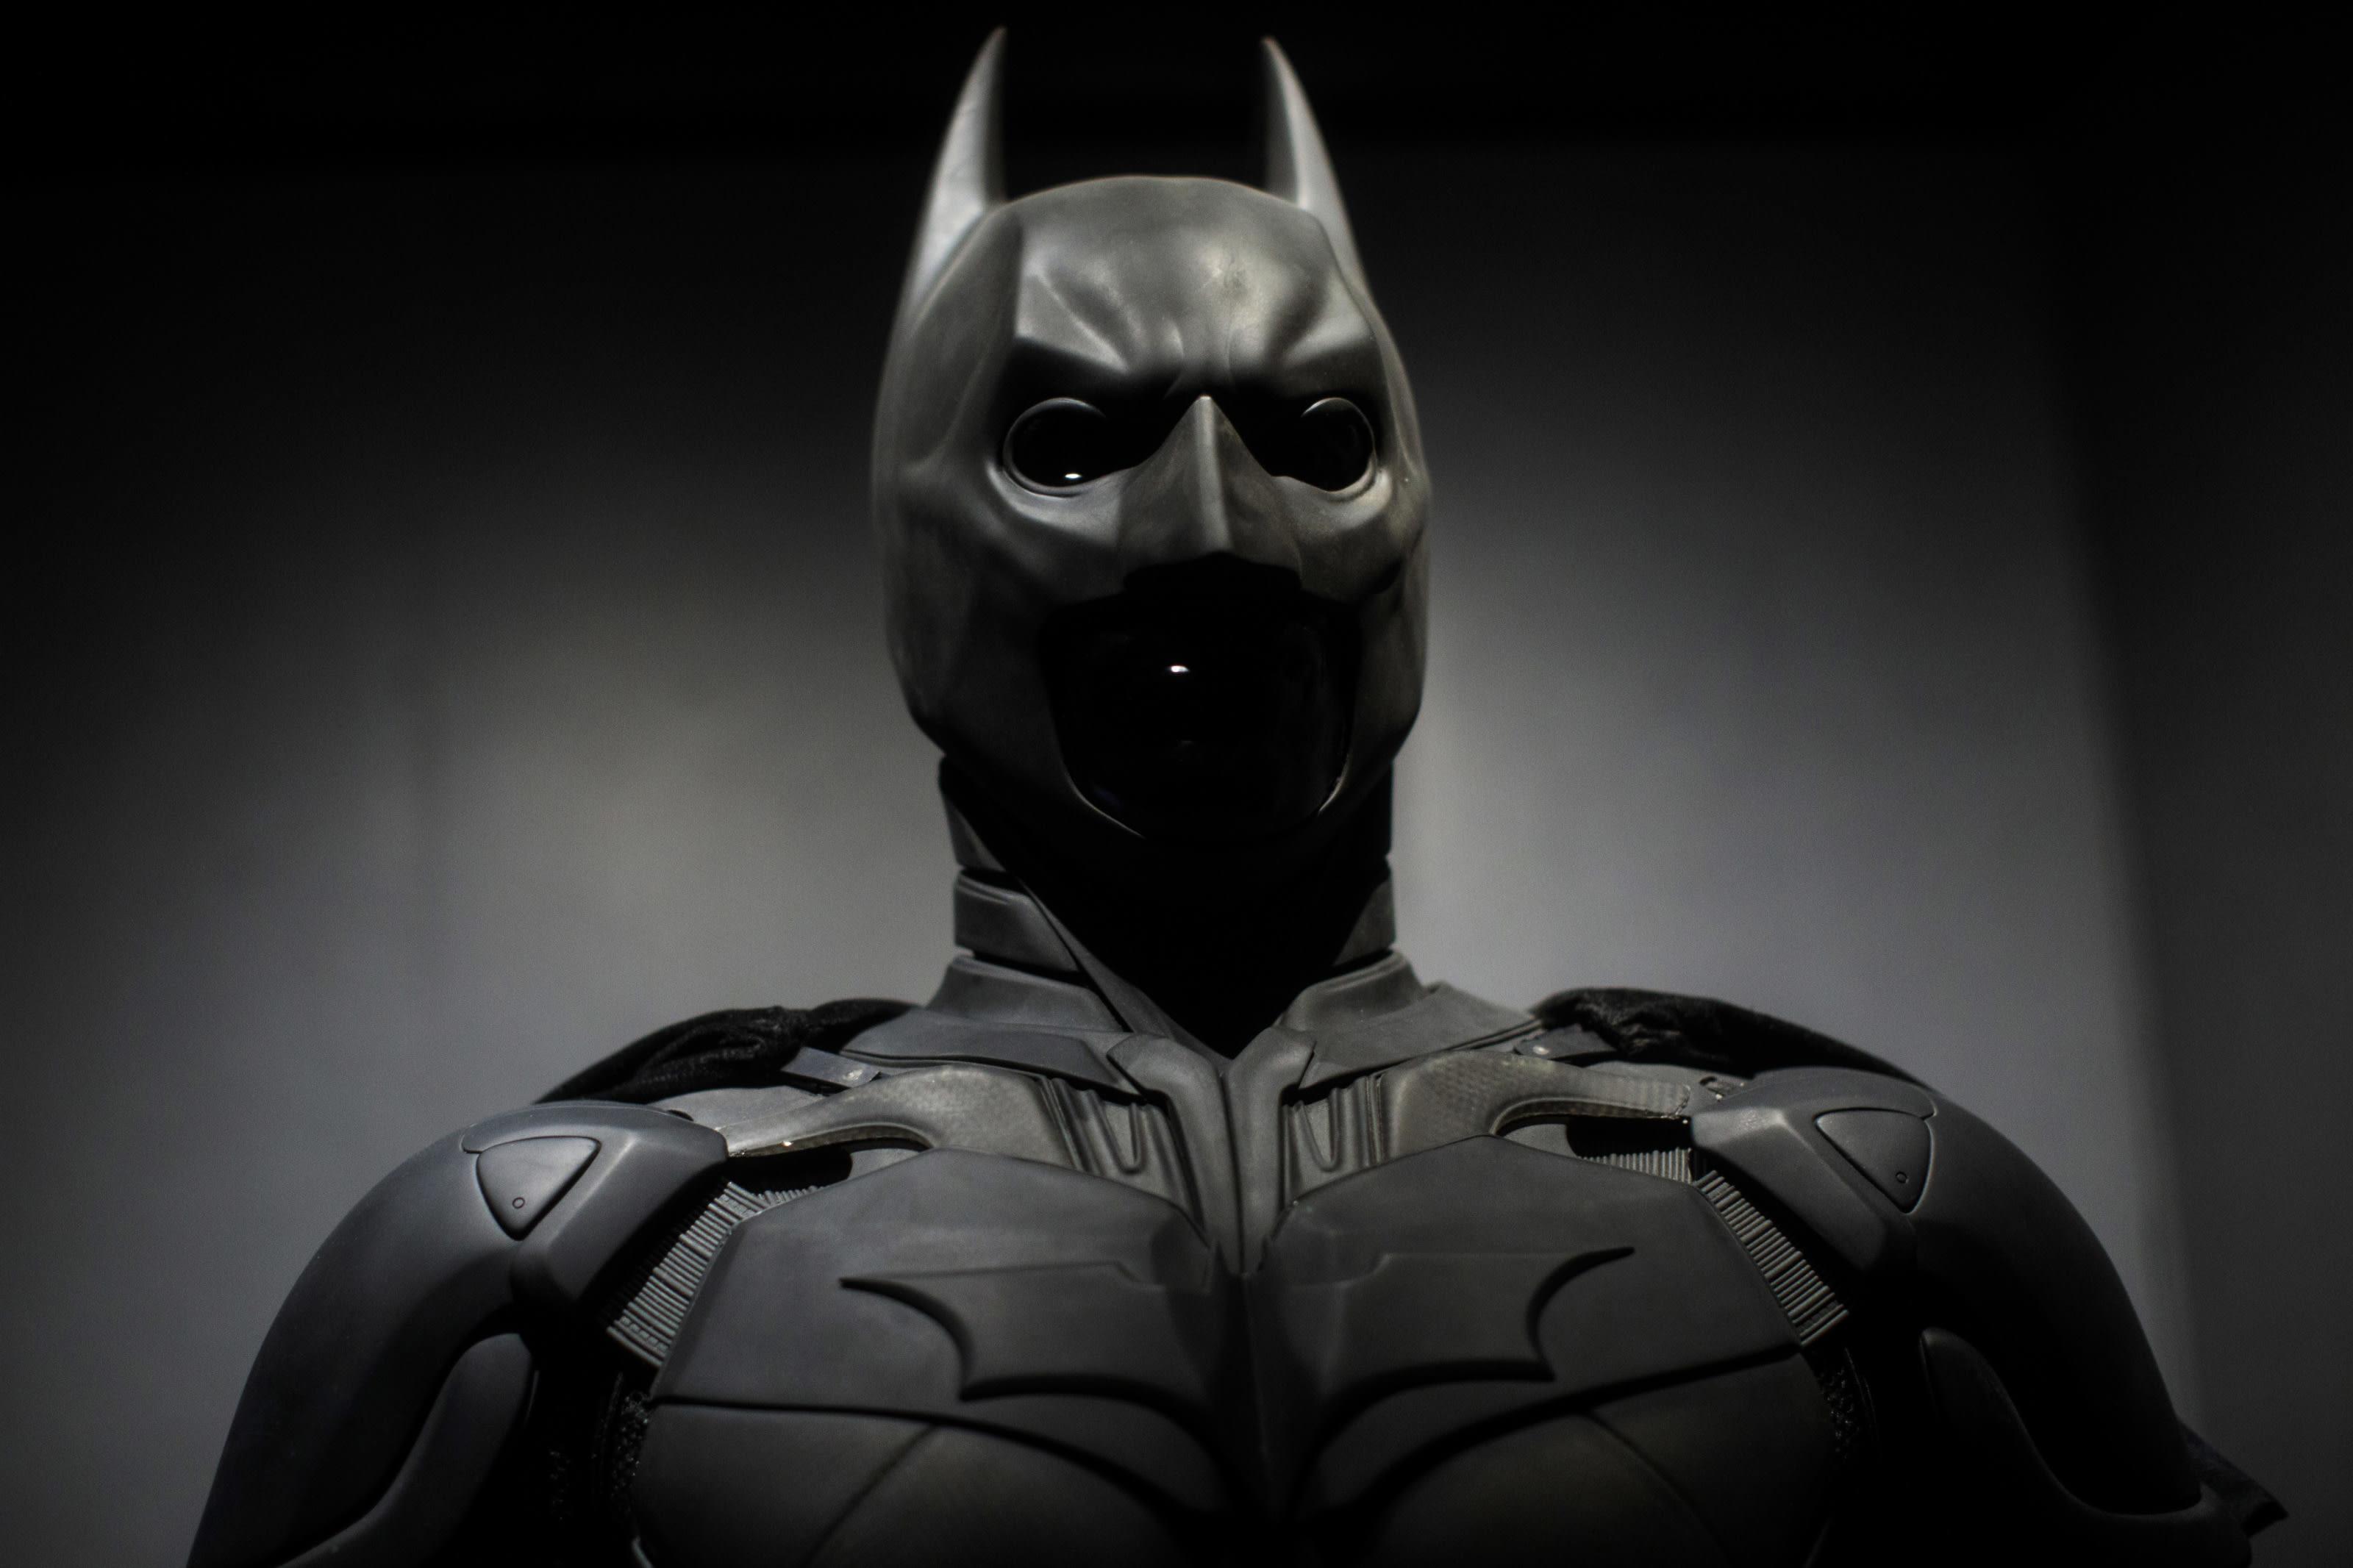 Batman, The Batman, The Dark Knight Trilogy